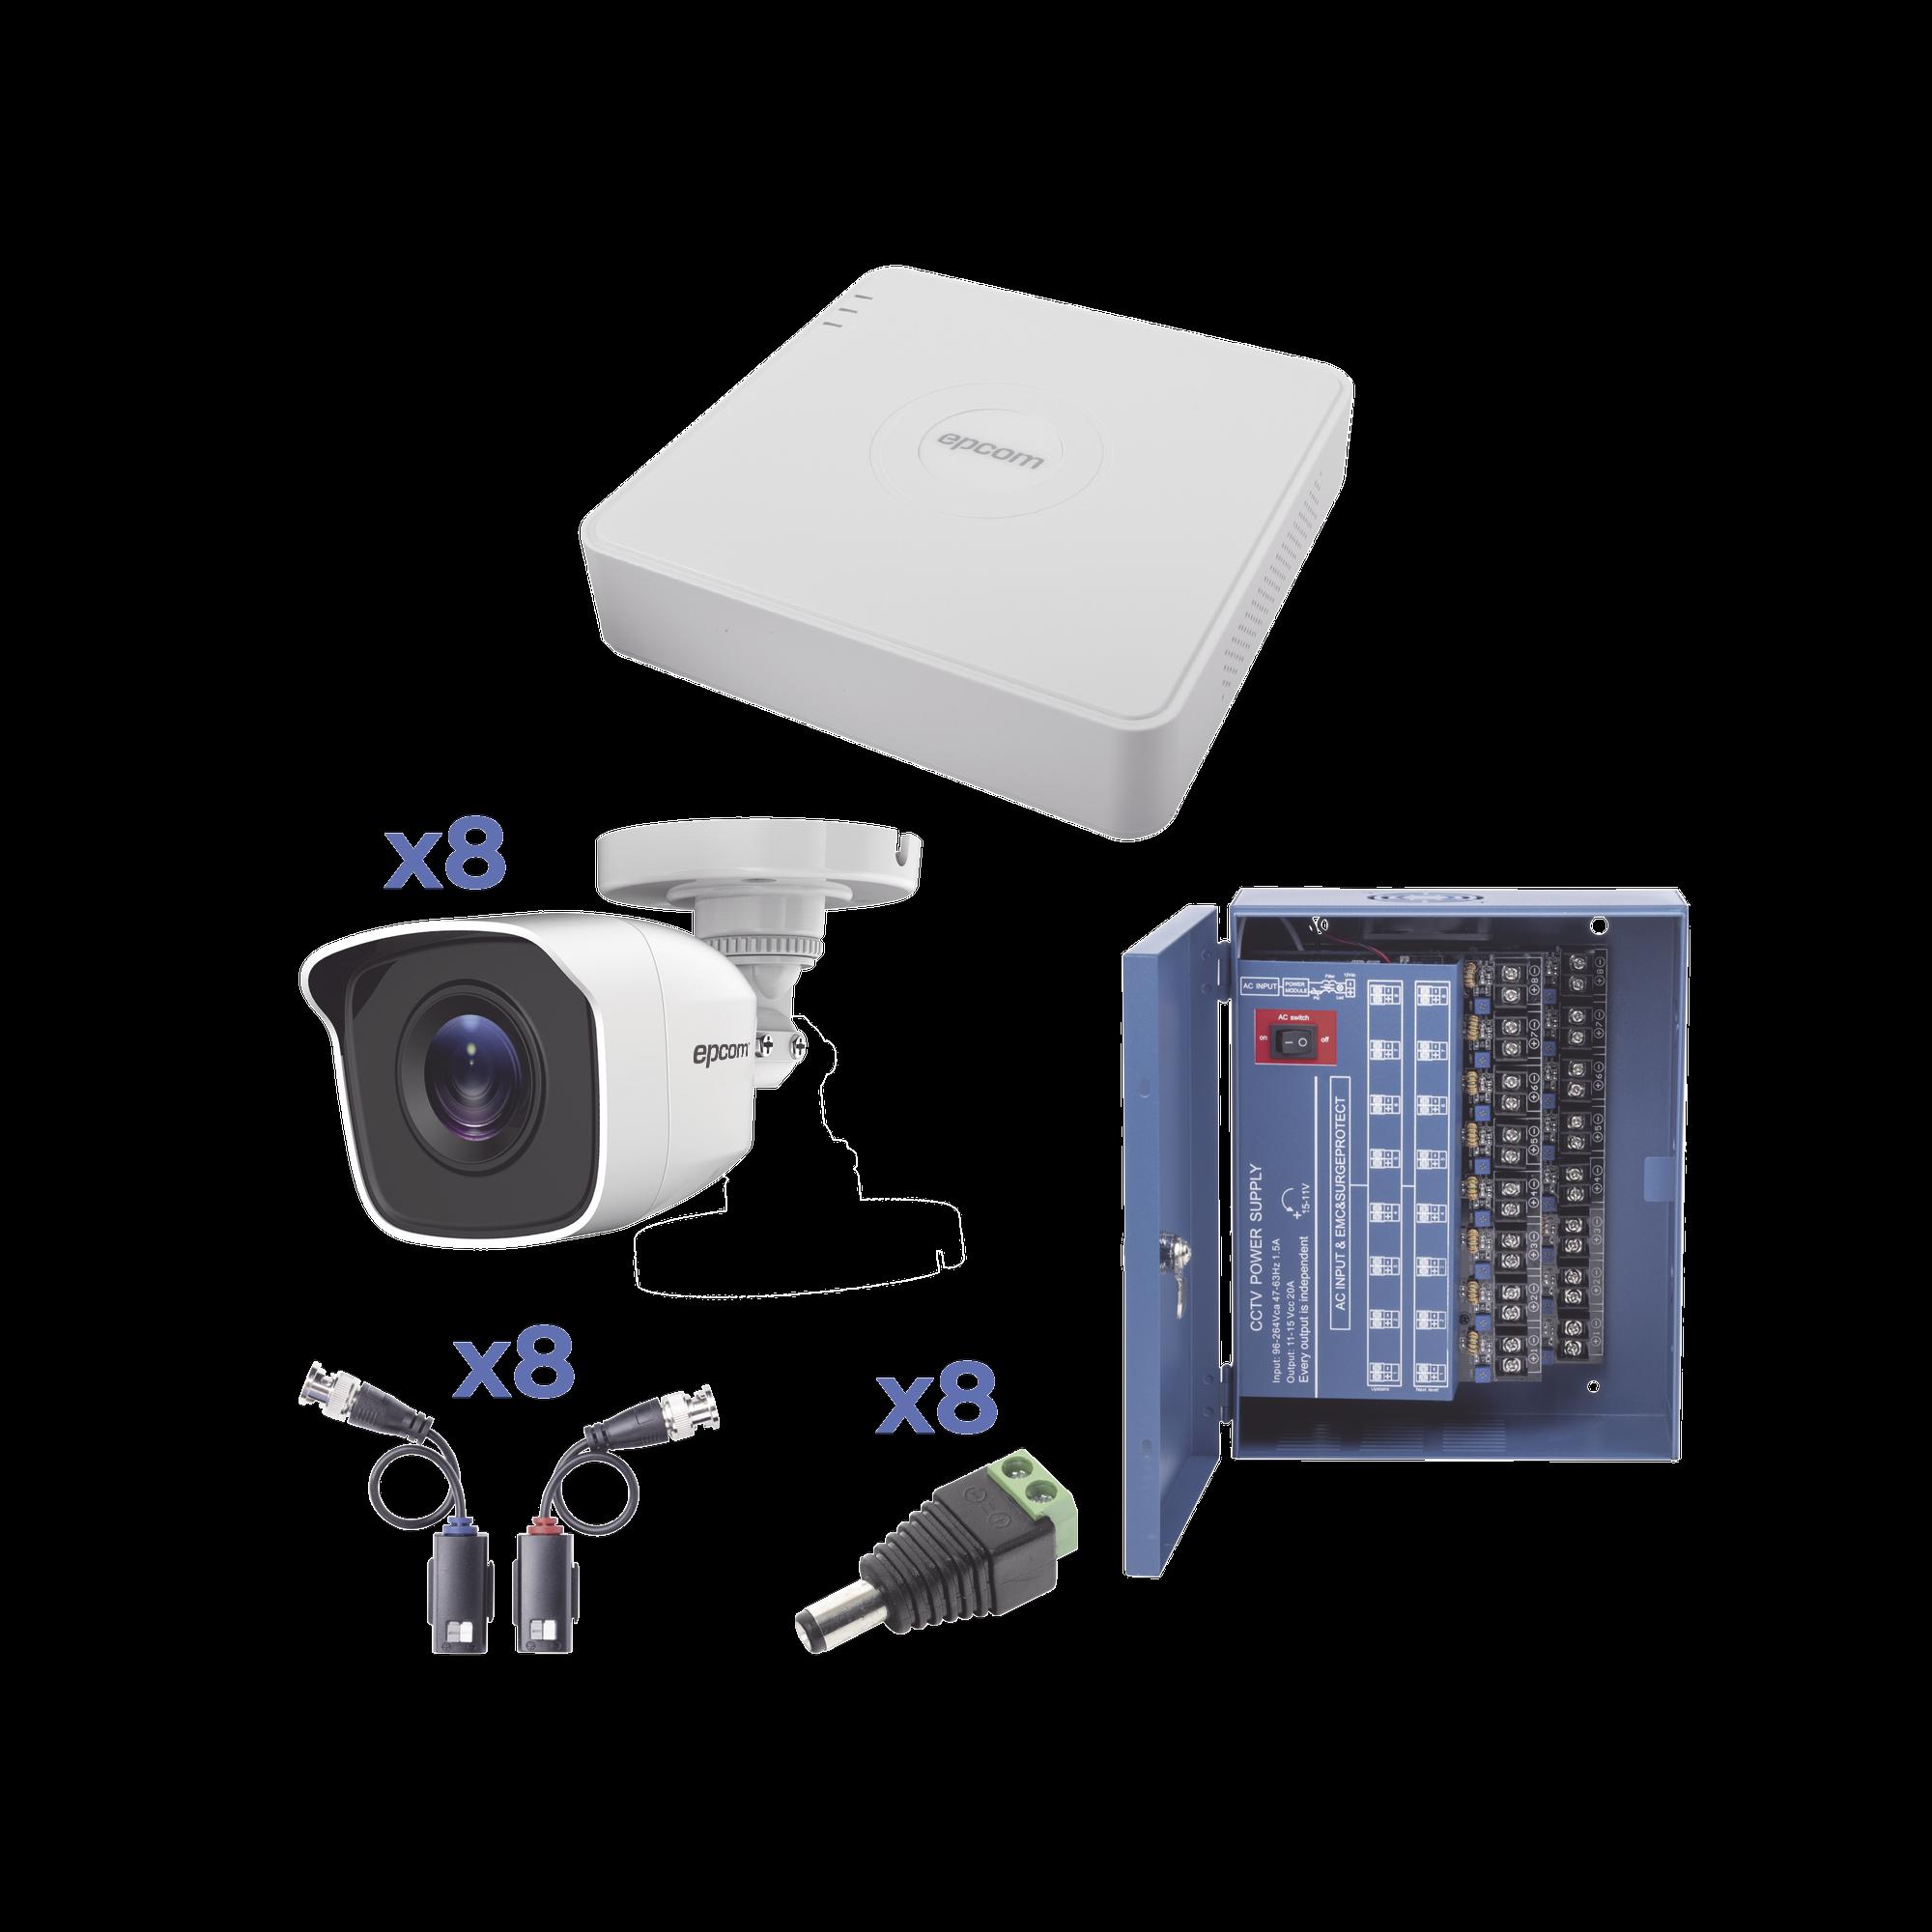 KIT TurboHD 720p / Incluye DVR 8 Ch / 8 Cámaras Balas (exterior 2.8 mm) / Conectores / Transceptores / Fuente de Poder Profesional hasta 15 Vcd para Larga Distancia